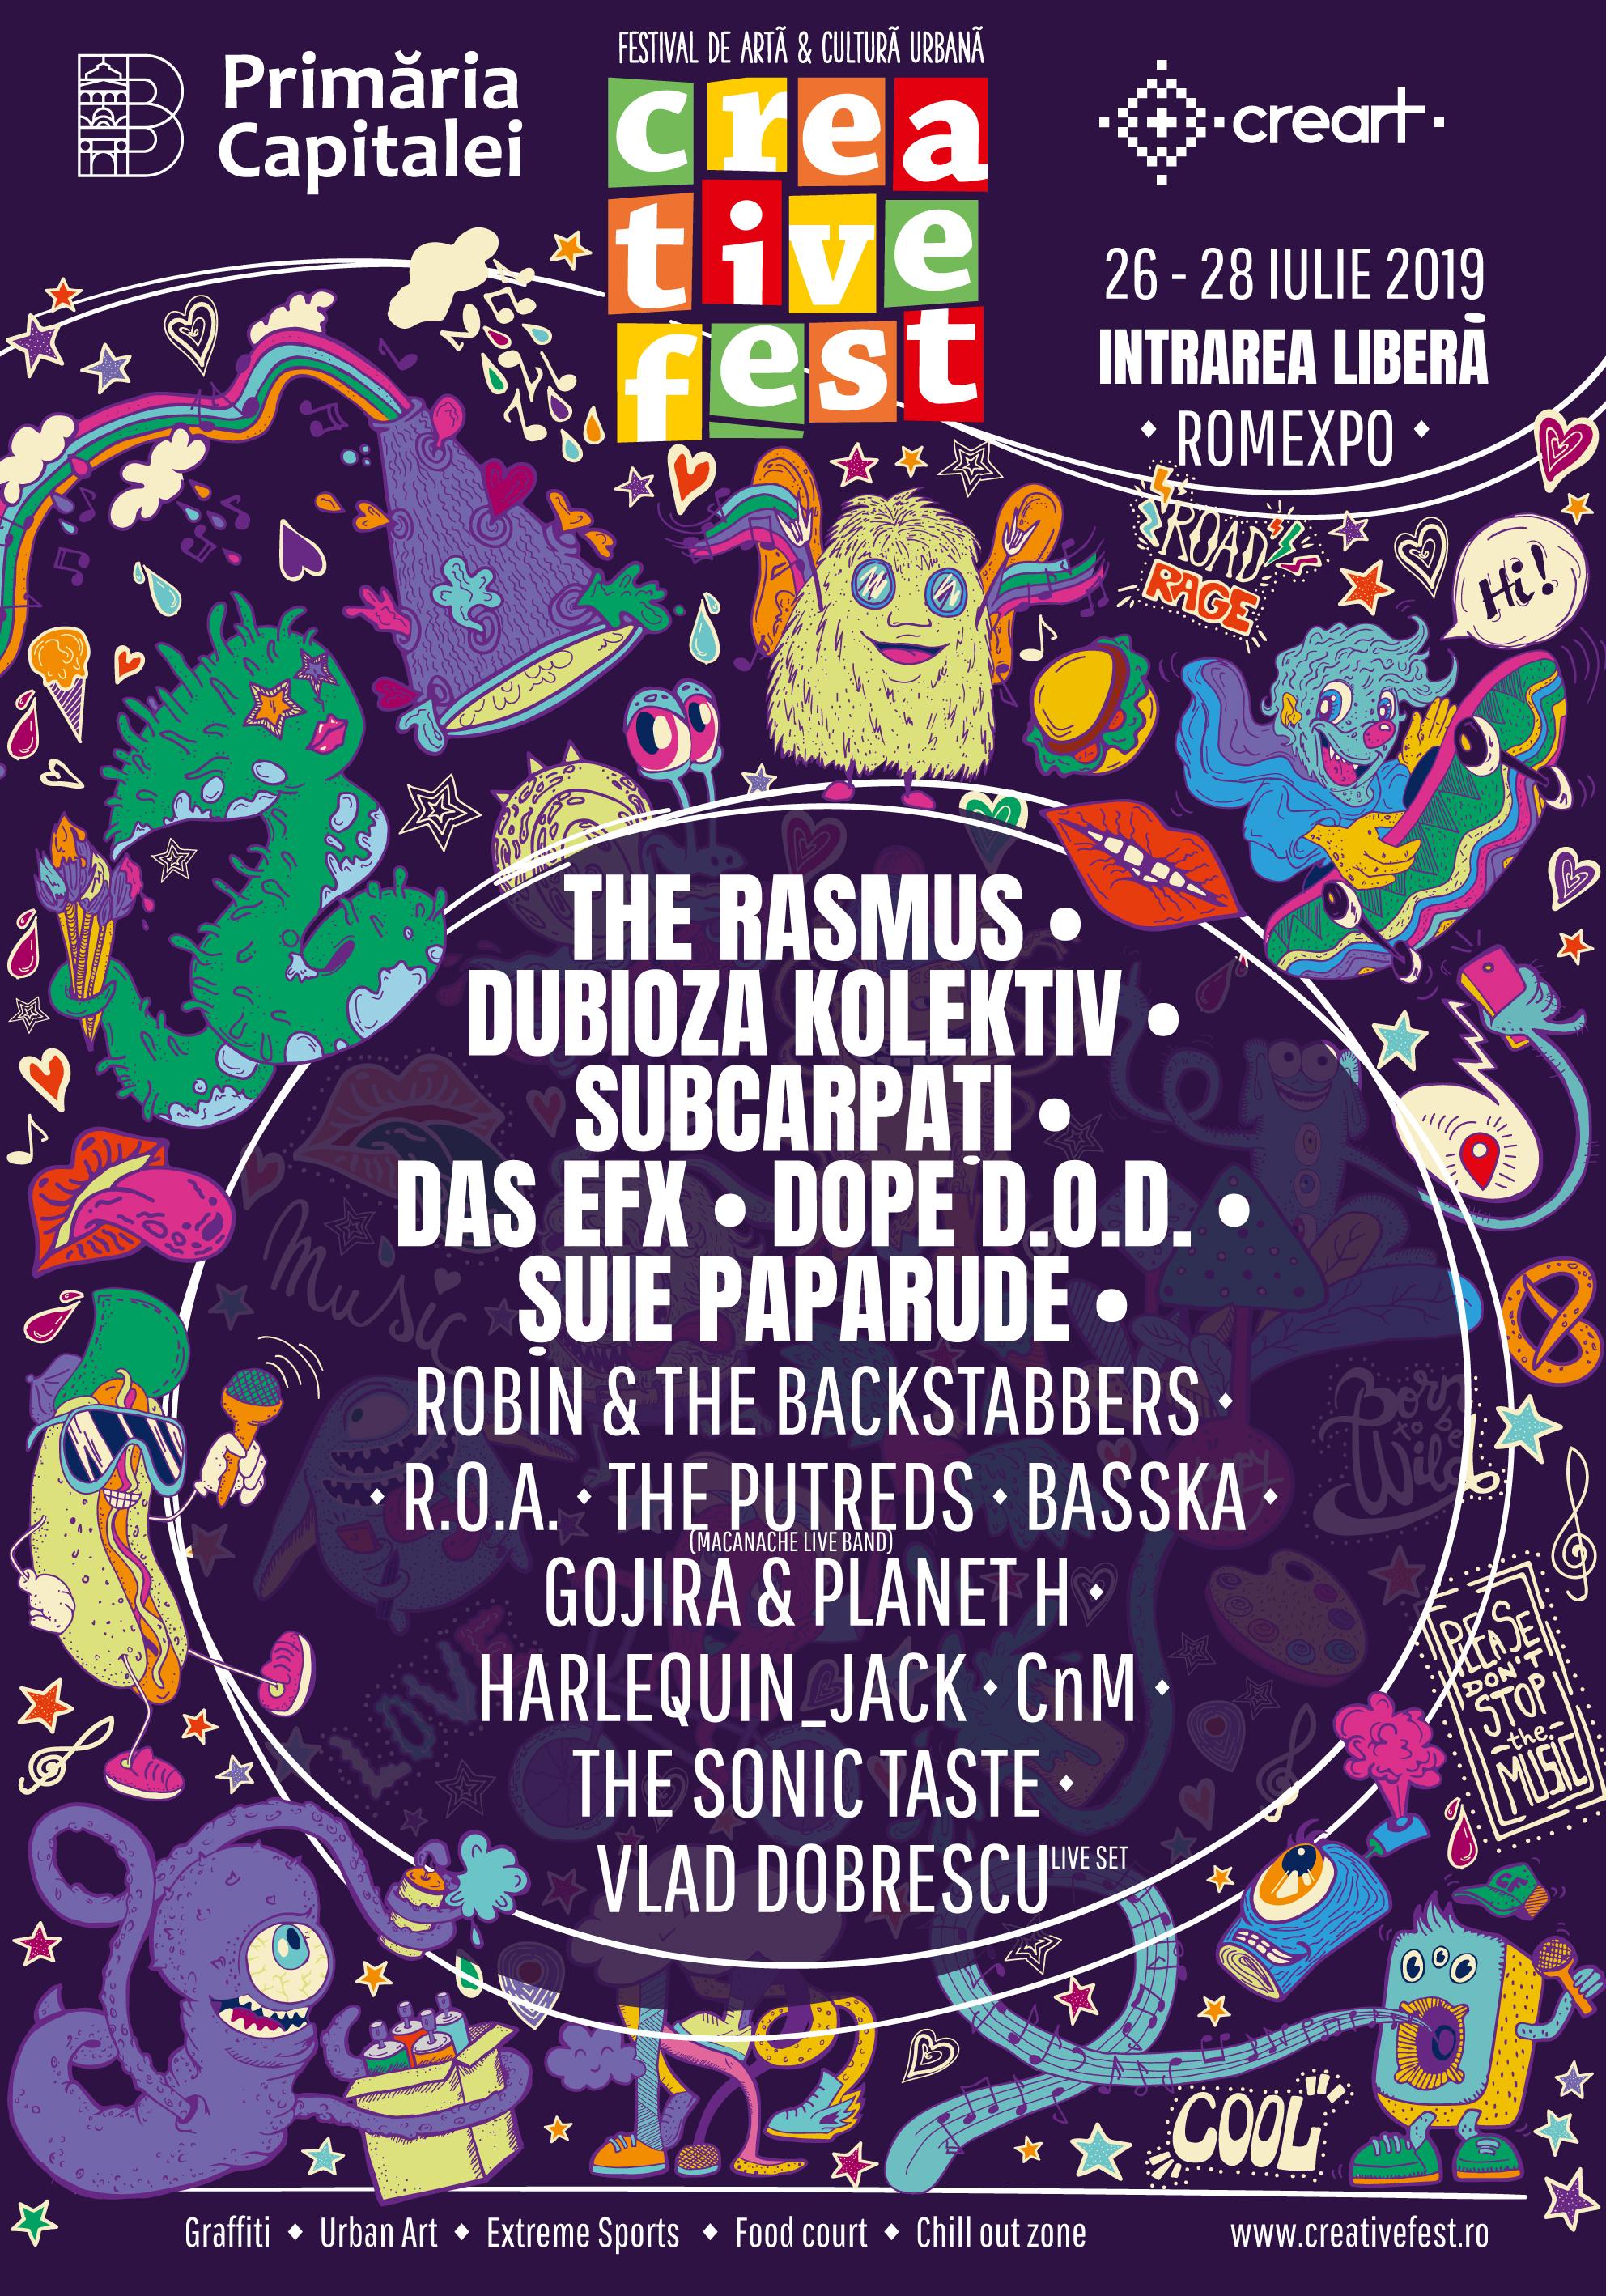 Creative Fest 2019 la Romexpo